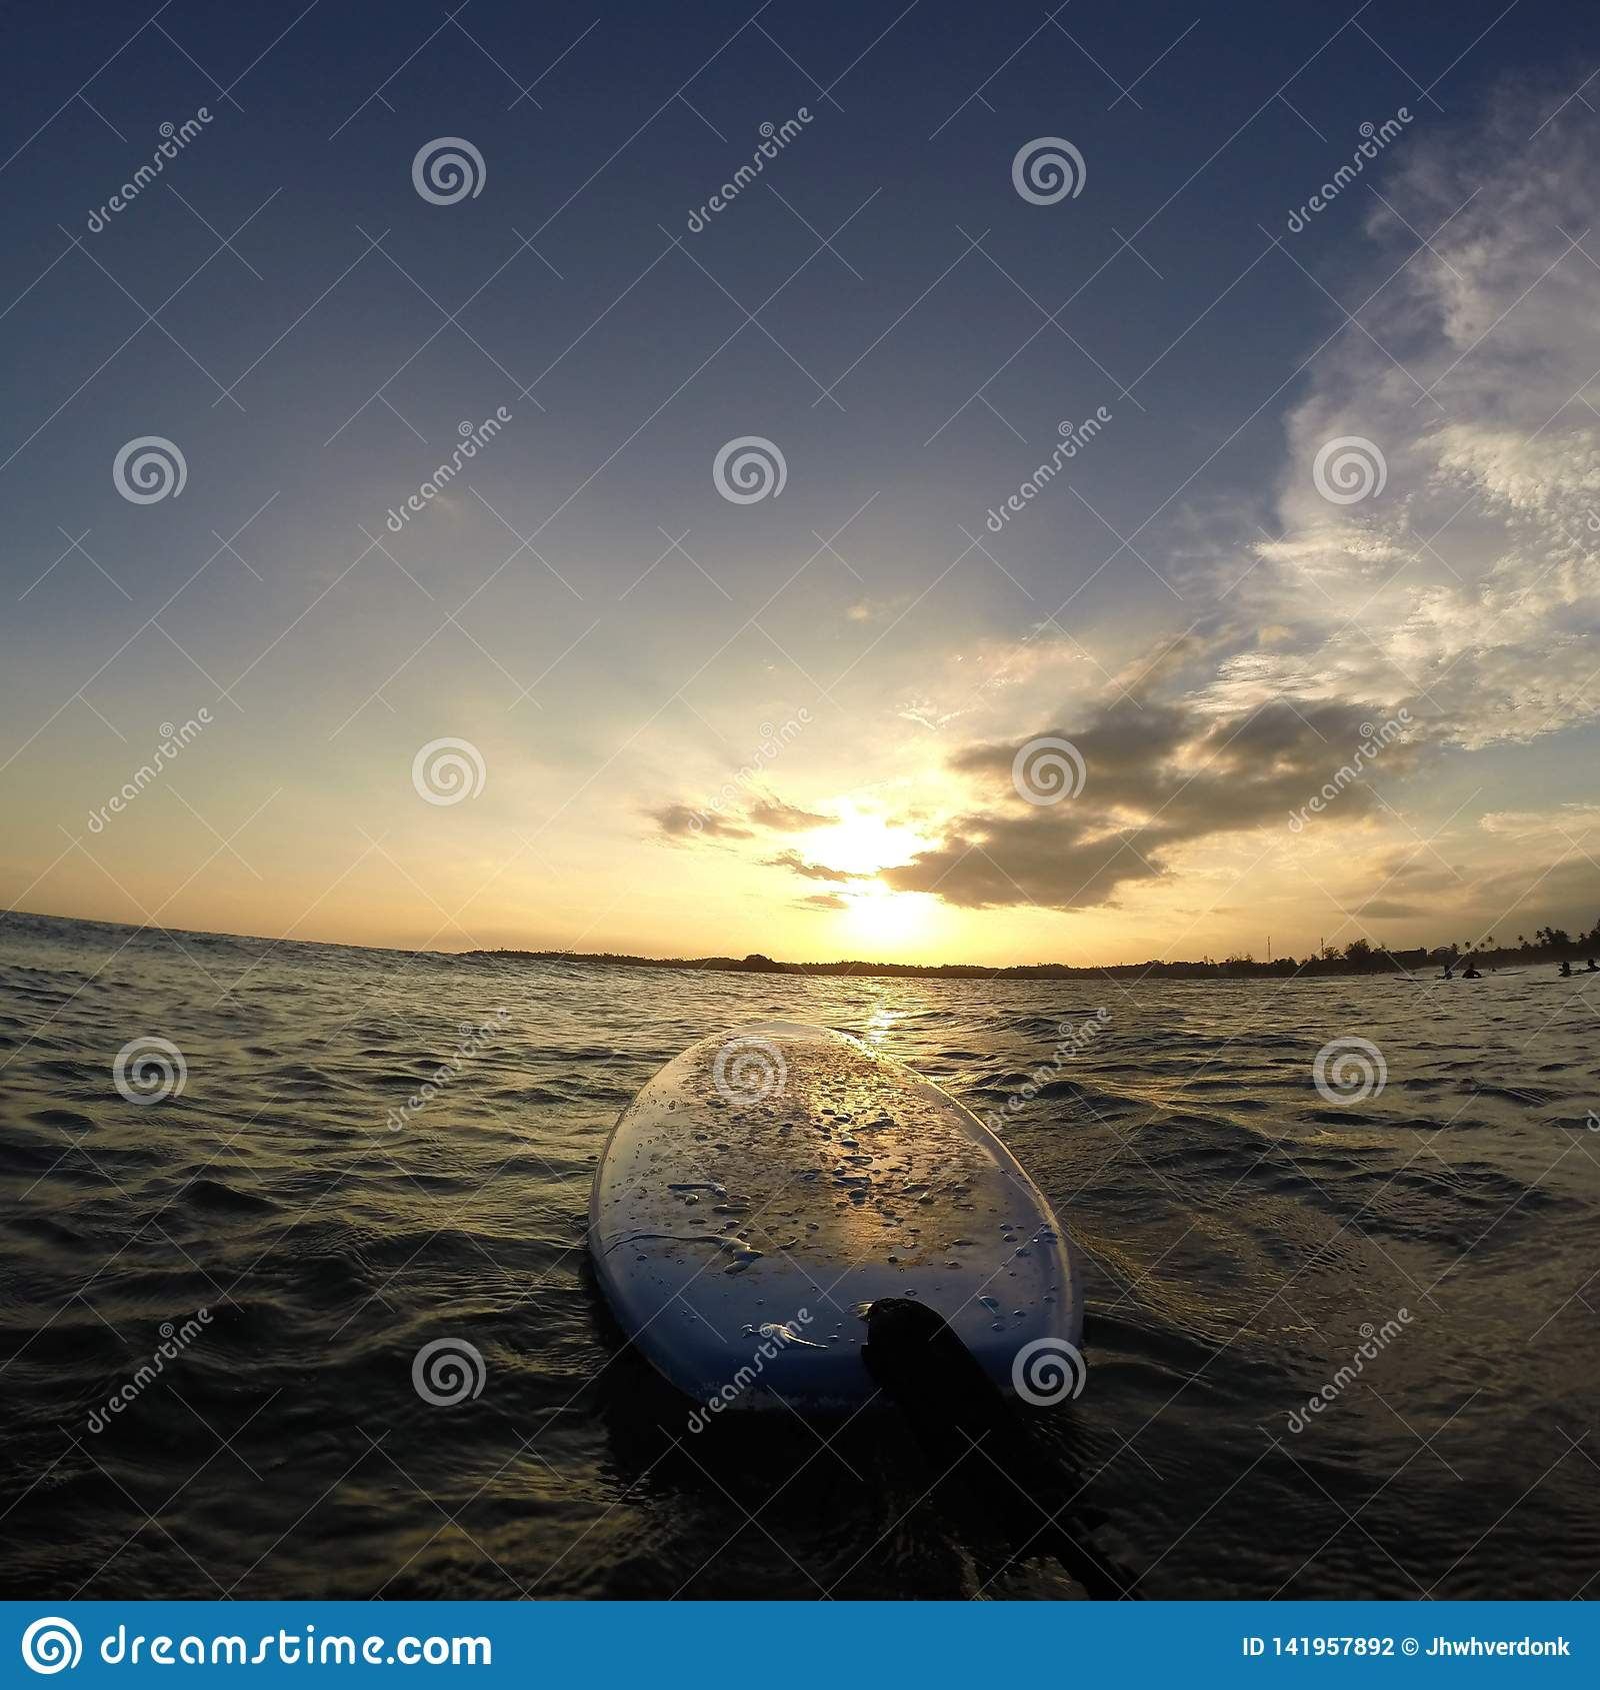 Surfboard в воде с красивым восходом солнца